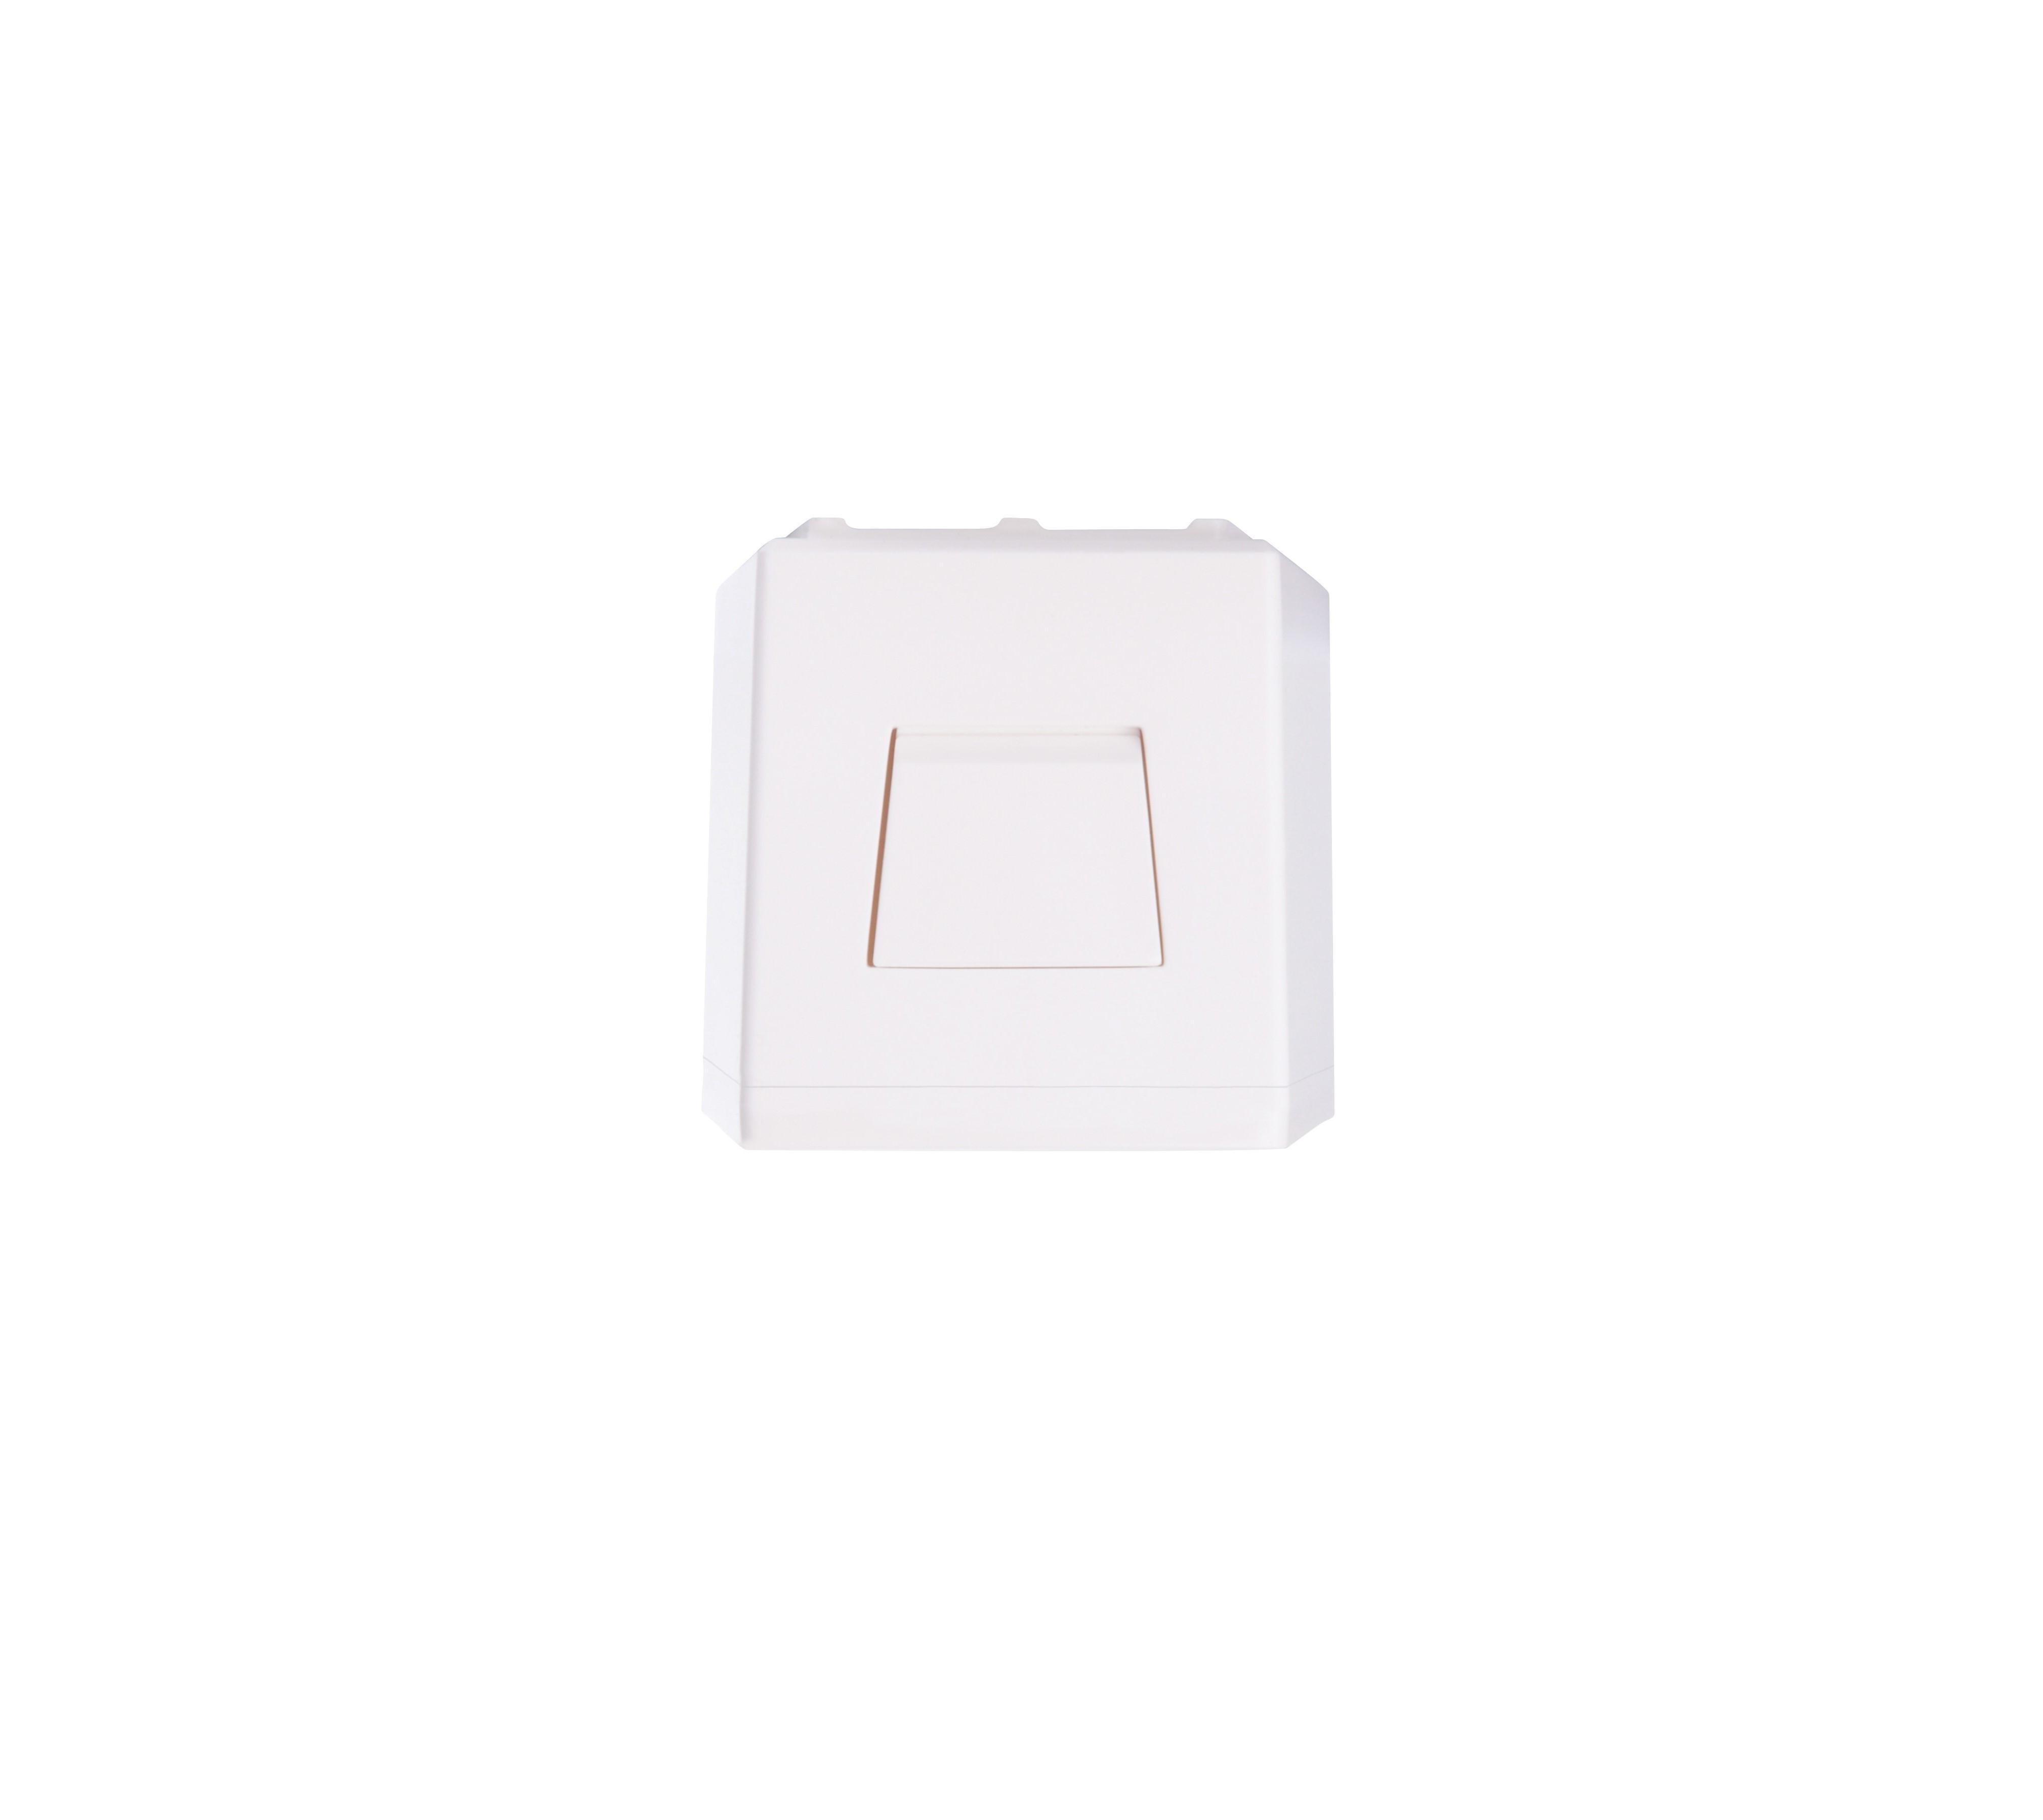 Lampa emergenta led Intelight 94769   3h nementinut test automat 1